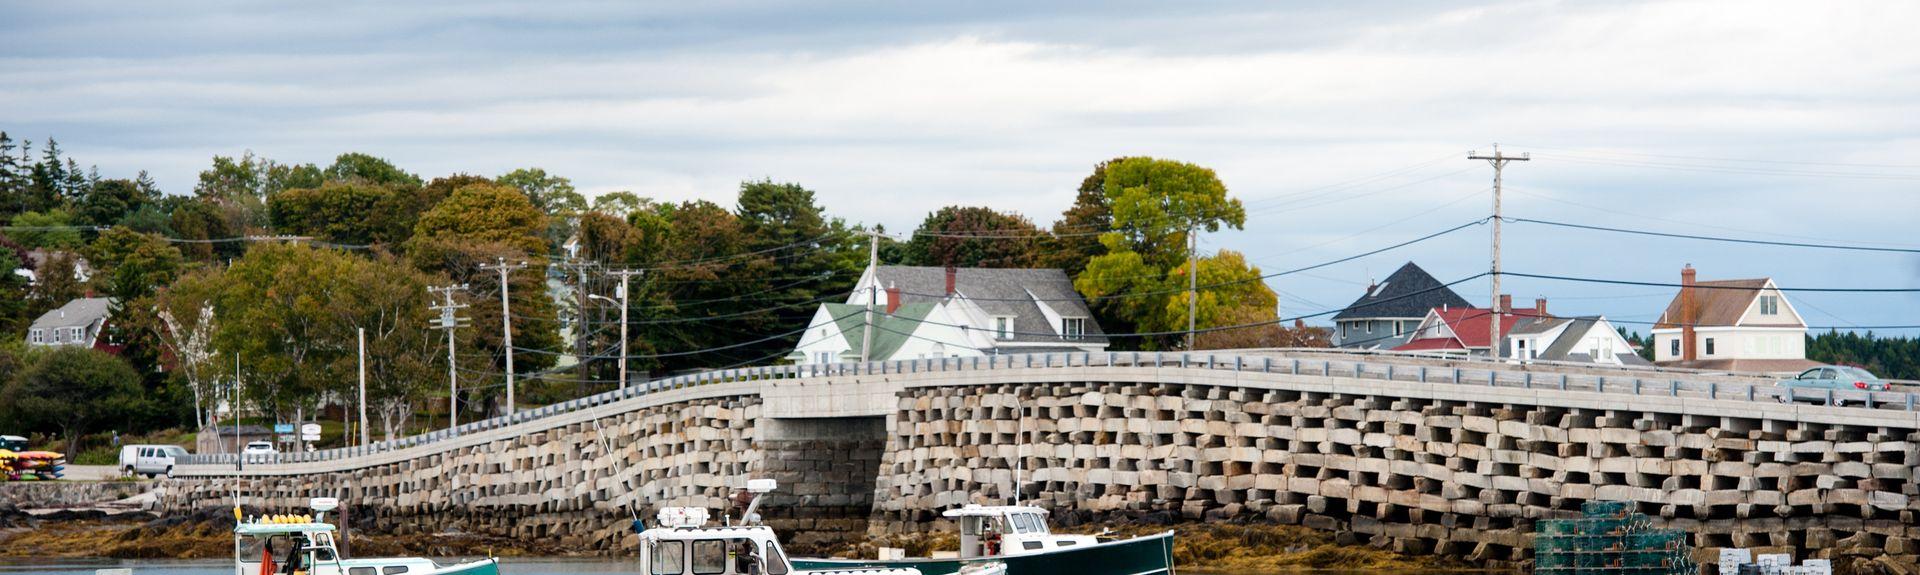 Orrs Island, Maine, Verenigde Staten